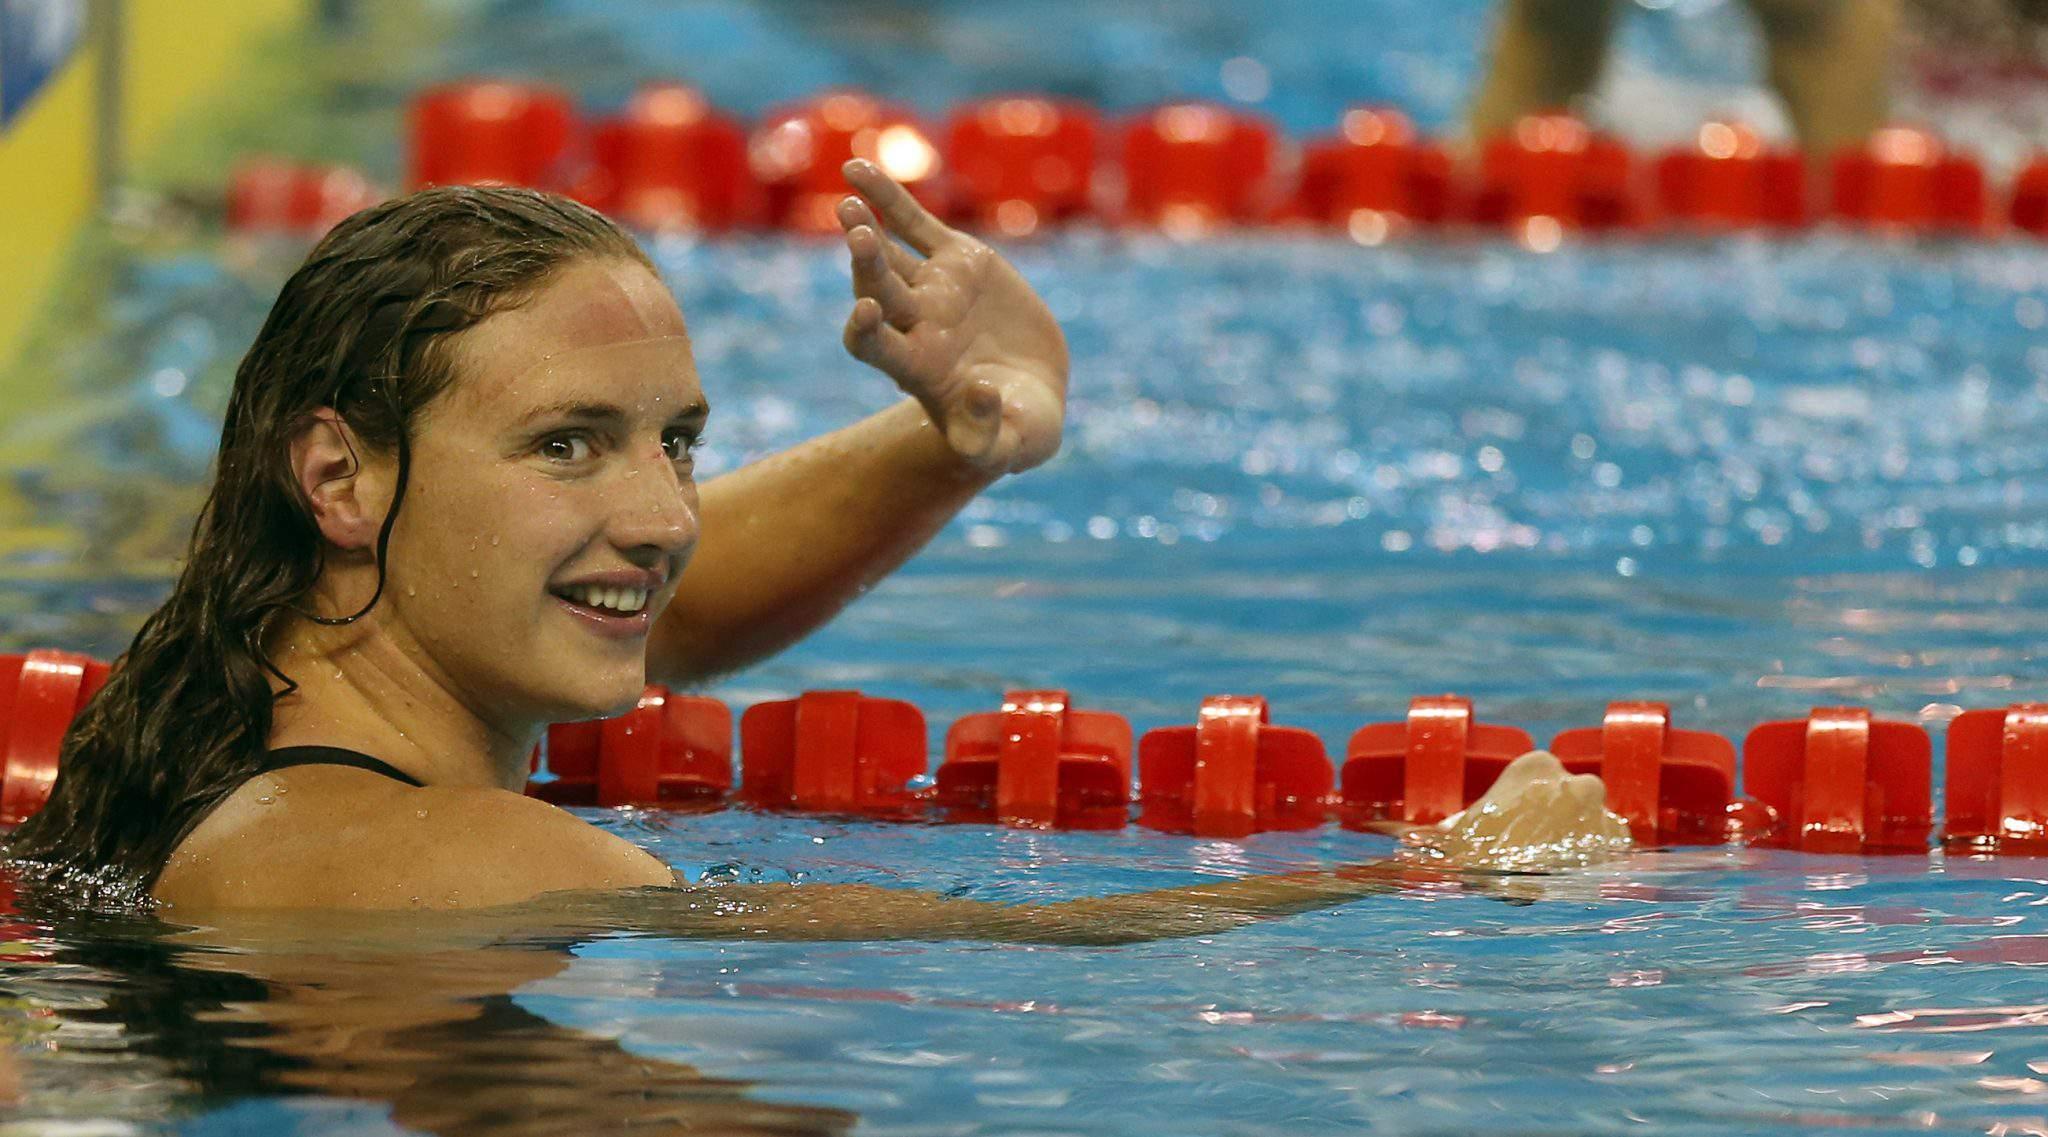 Krisztina Egerszegi 7 Olympic medals nudes (84 photos), Tits, Sideboobs, Boobs, in bikini 2019